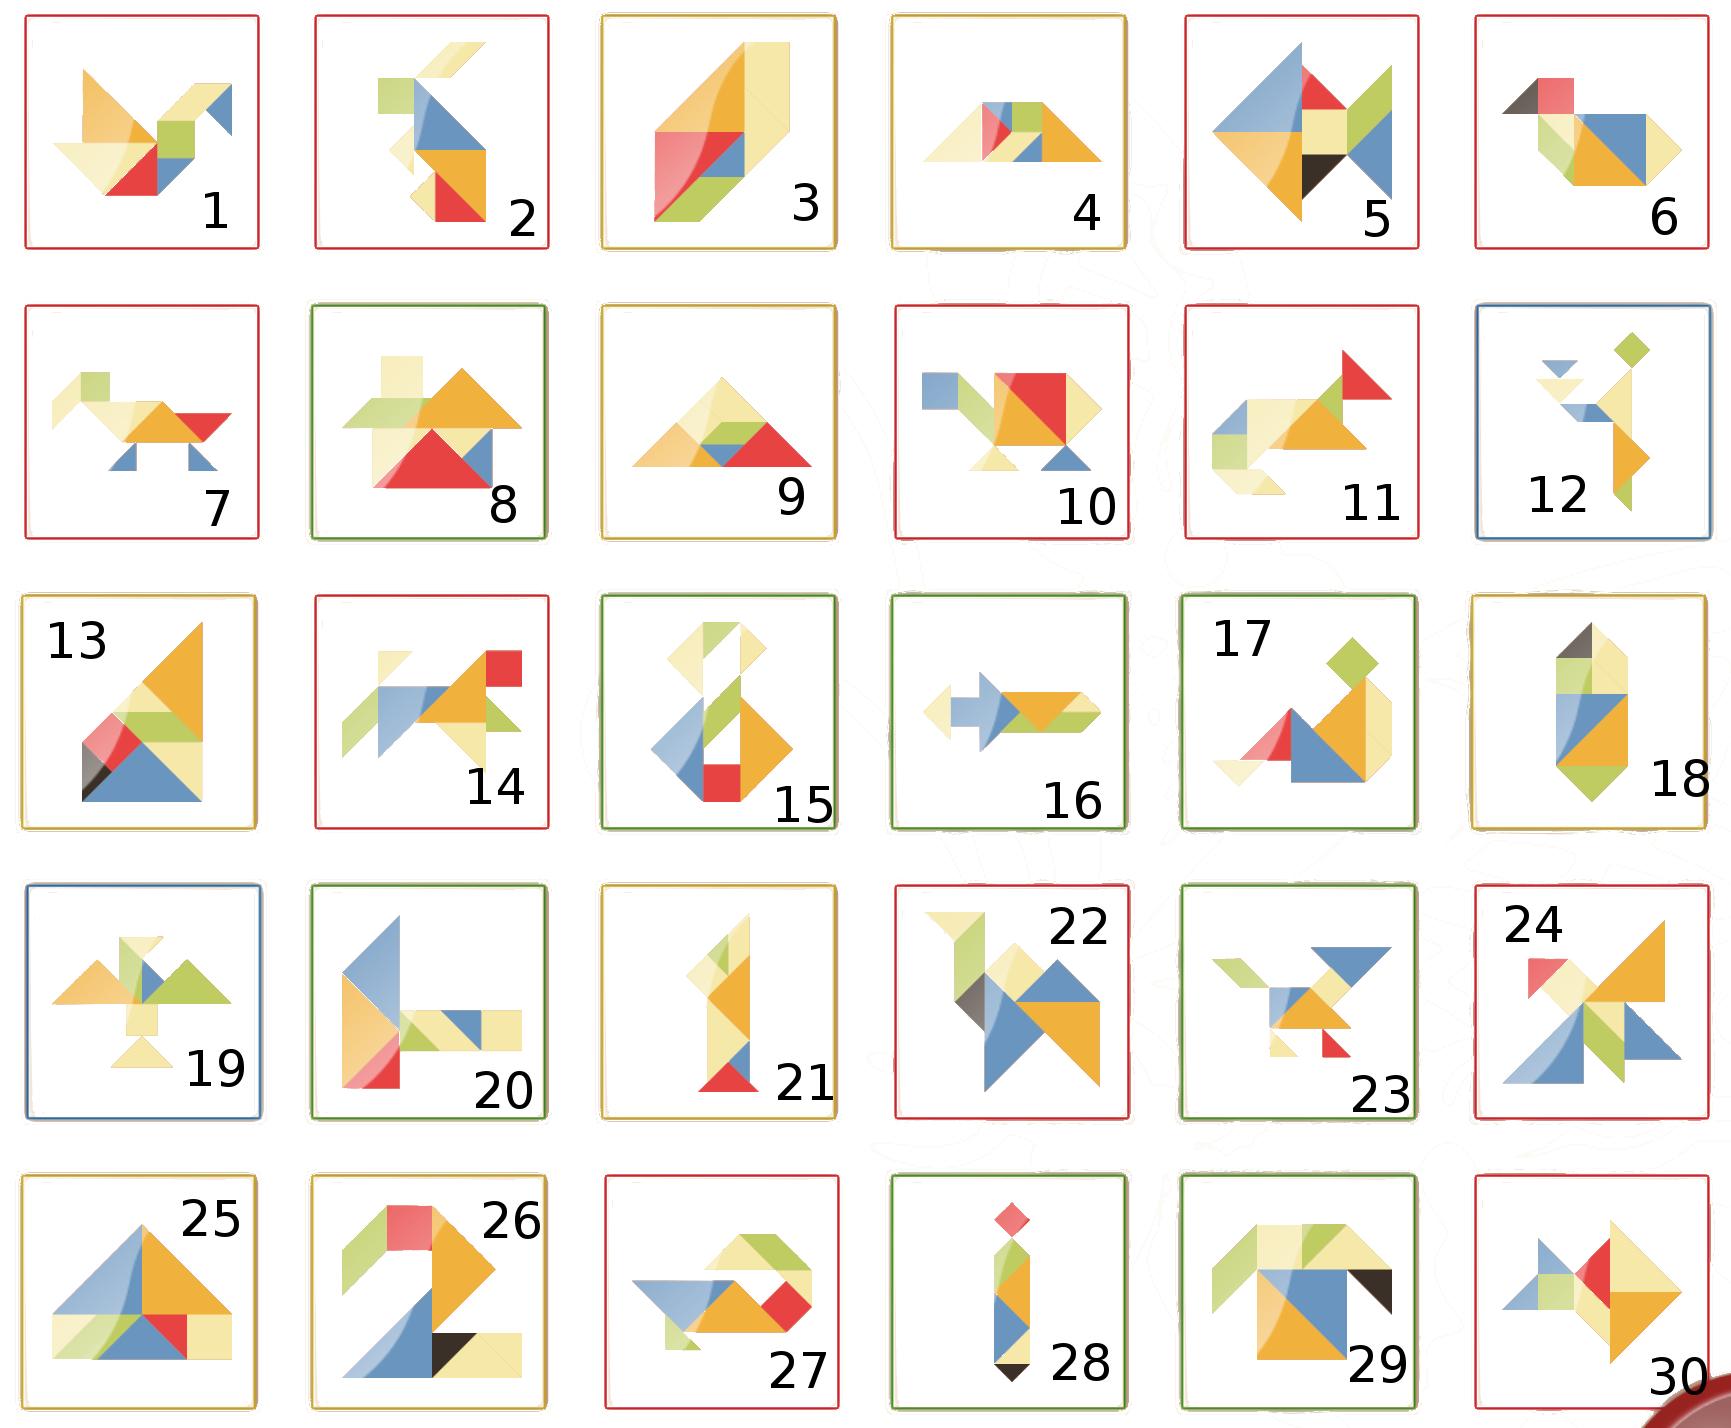 Apprendre Avec Maman: Tangram concernant Tangram Modèles Et Solutions